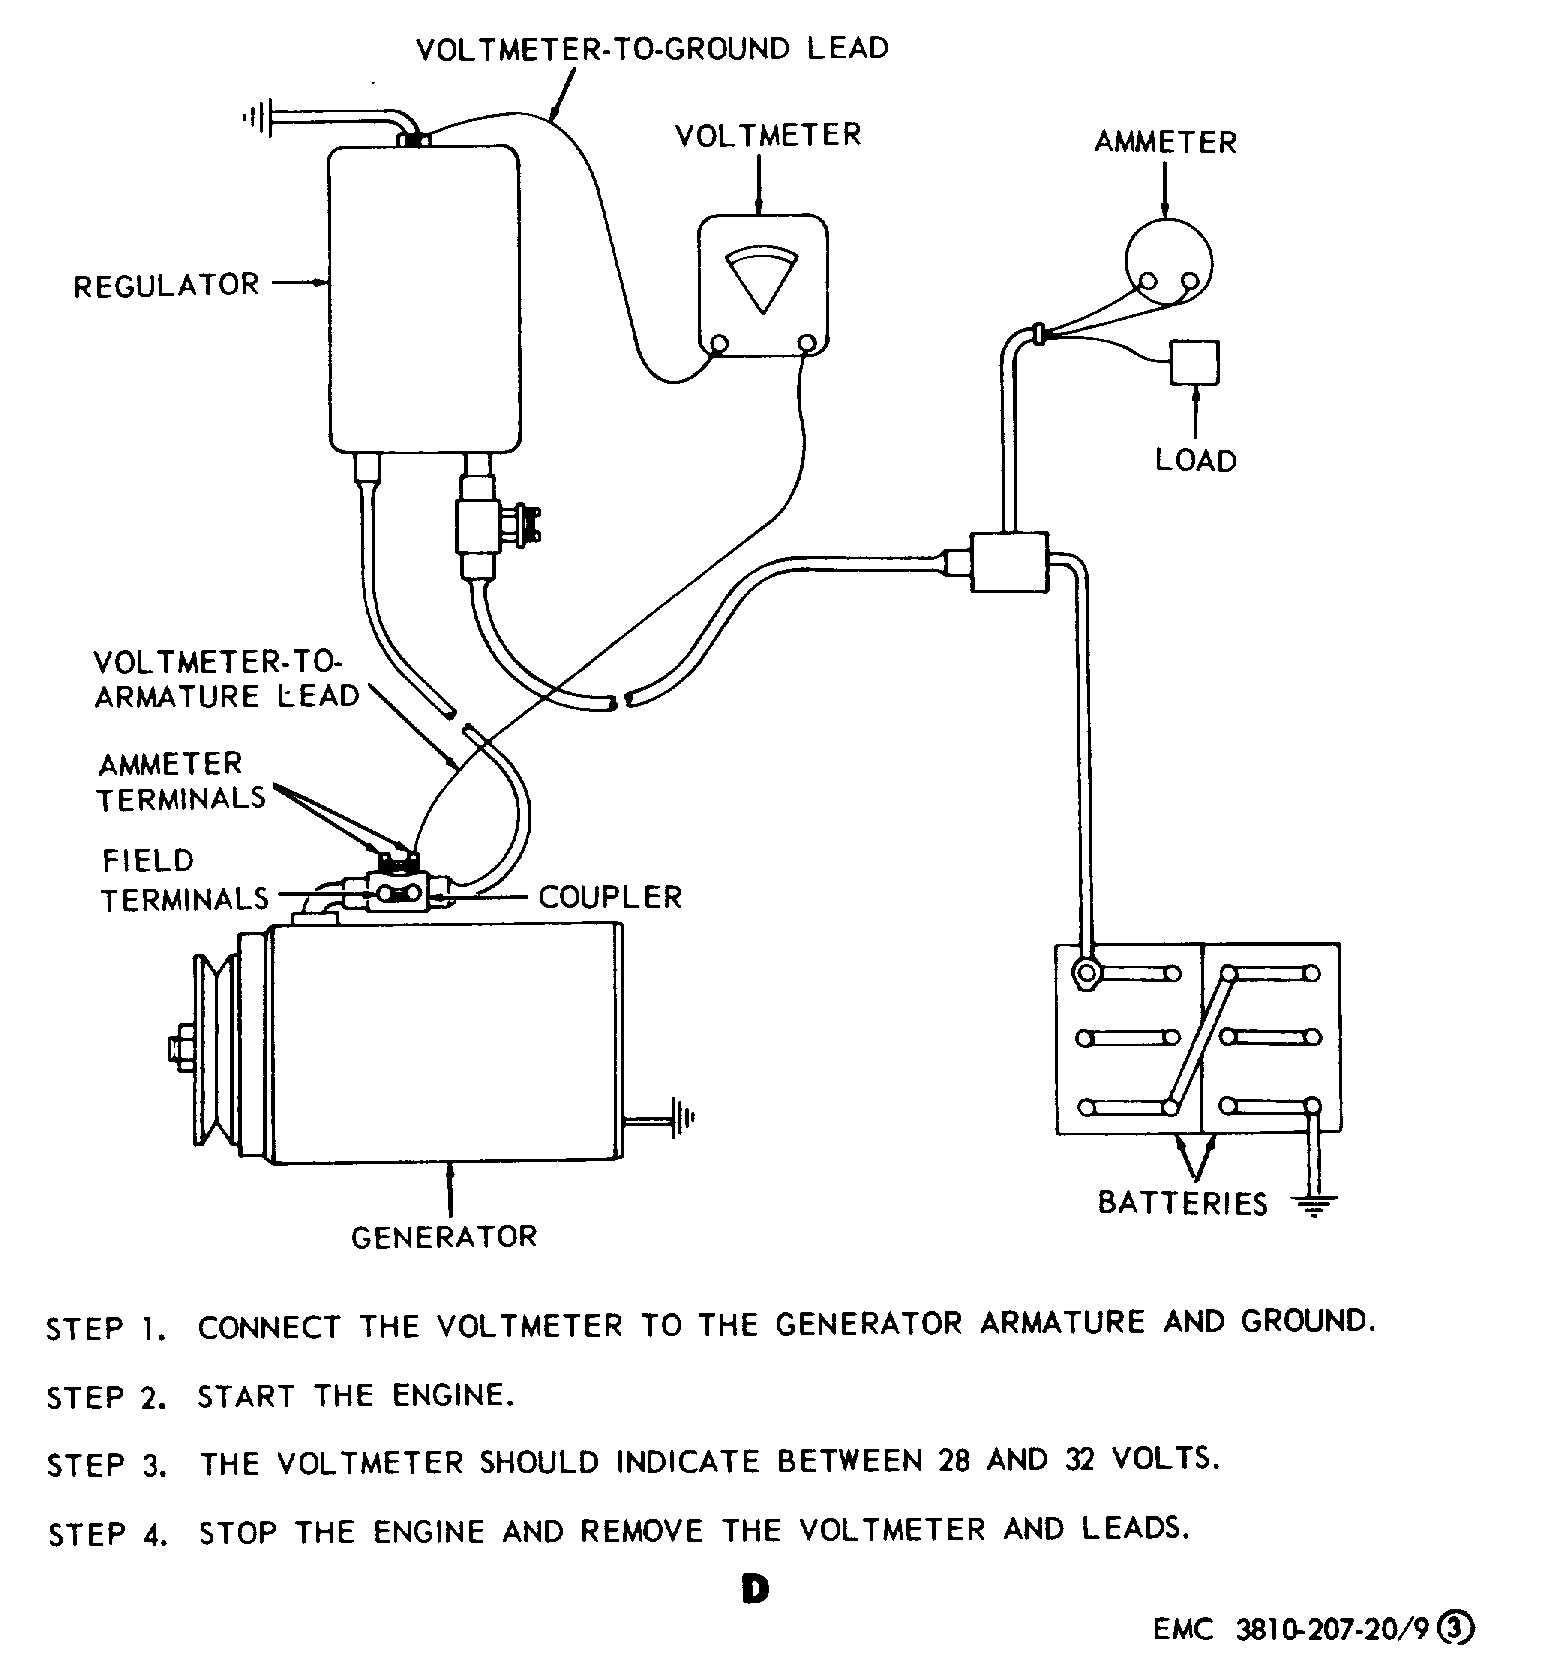 12 Volt Generator Voltage Regulator Wiring Diagram | Tractor Gen - 12 Volt Generator Voltage Regulator Wiring Diagram